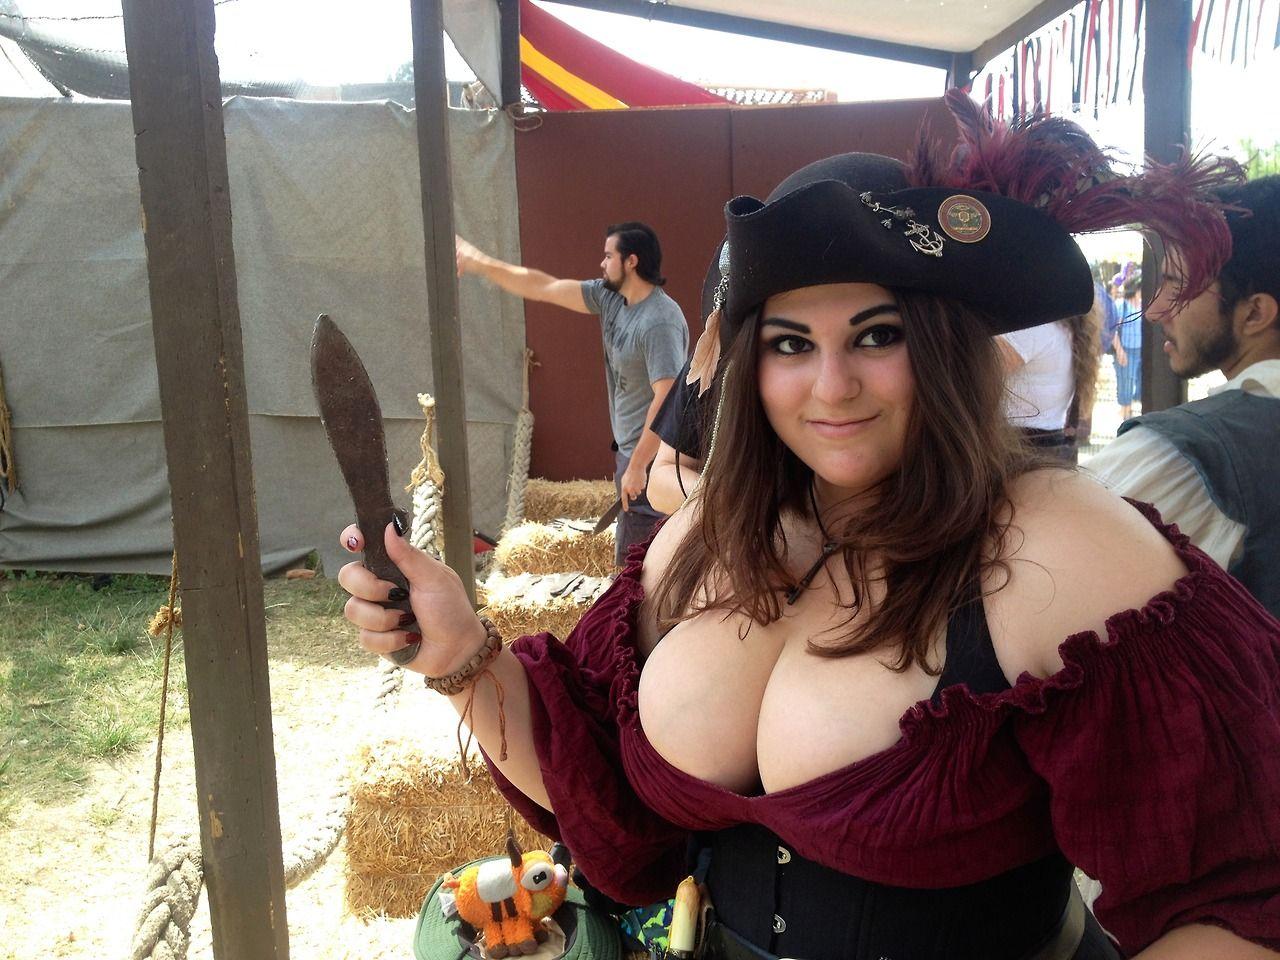 Renaissance fair boob pics